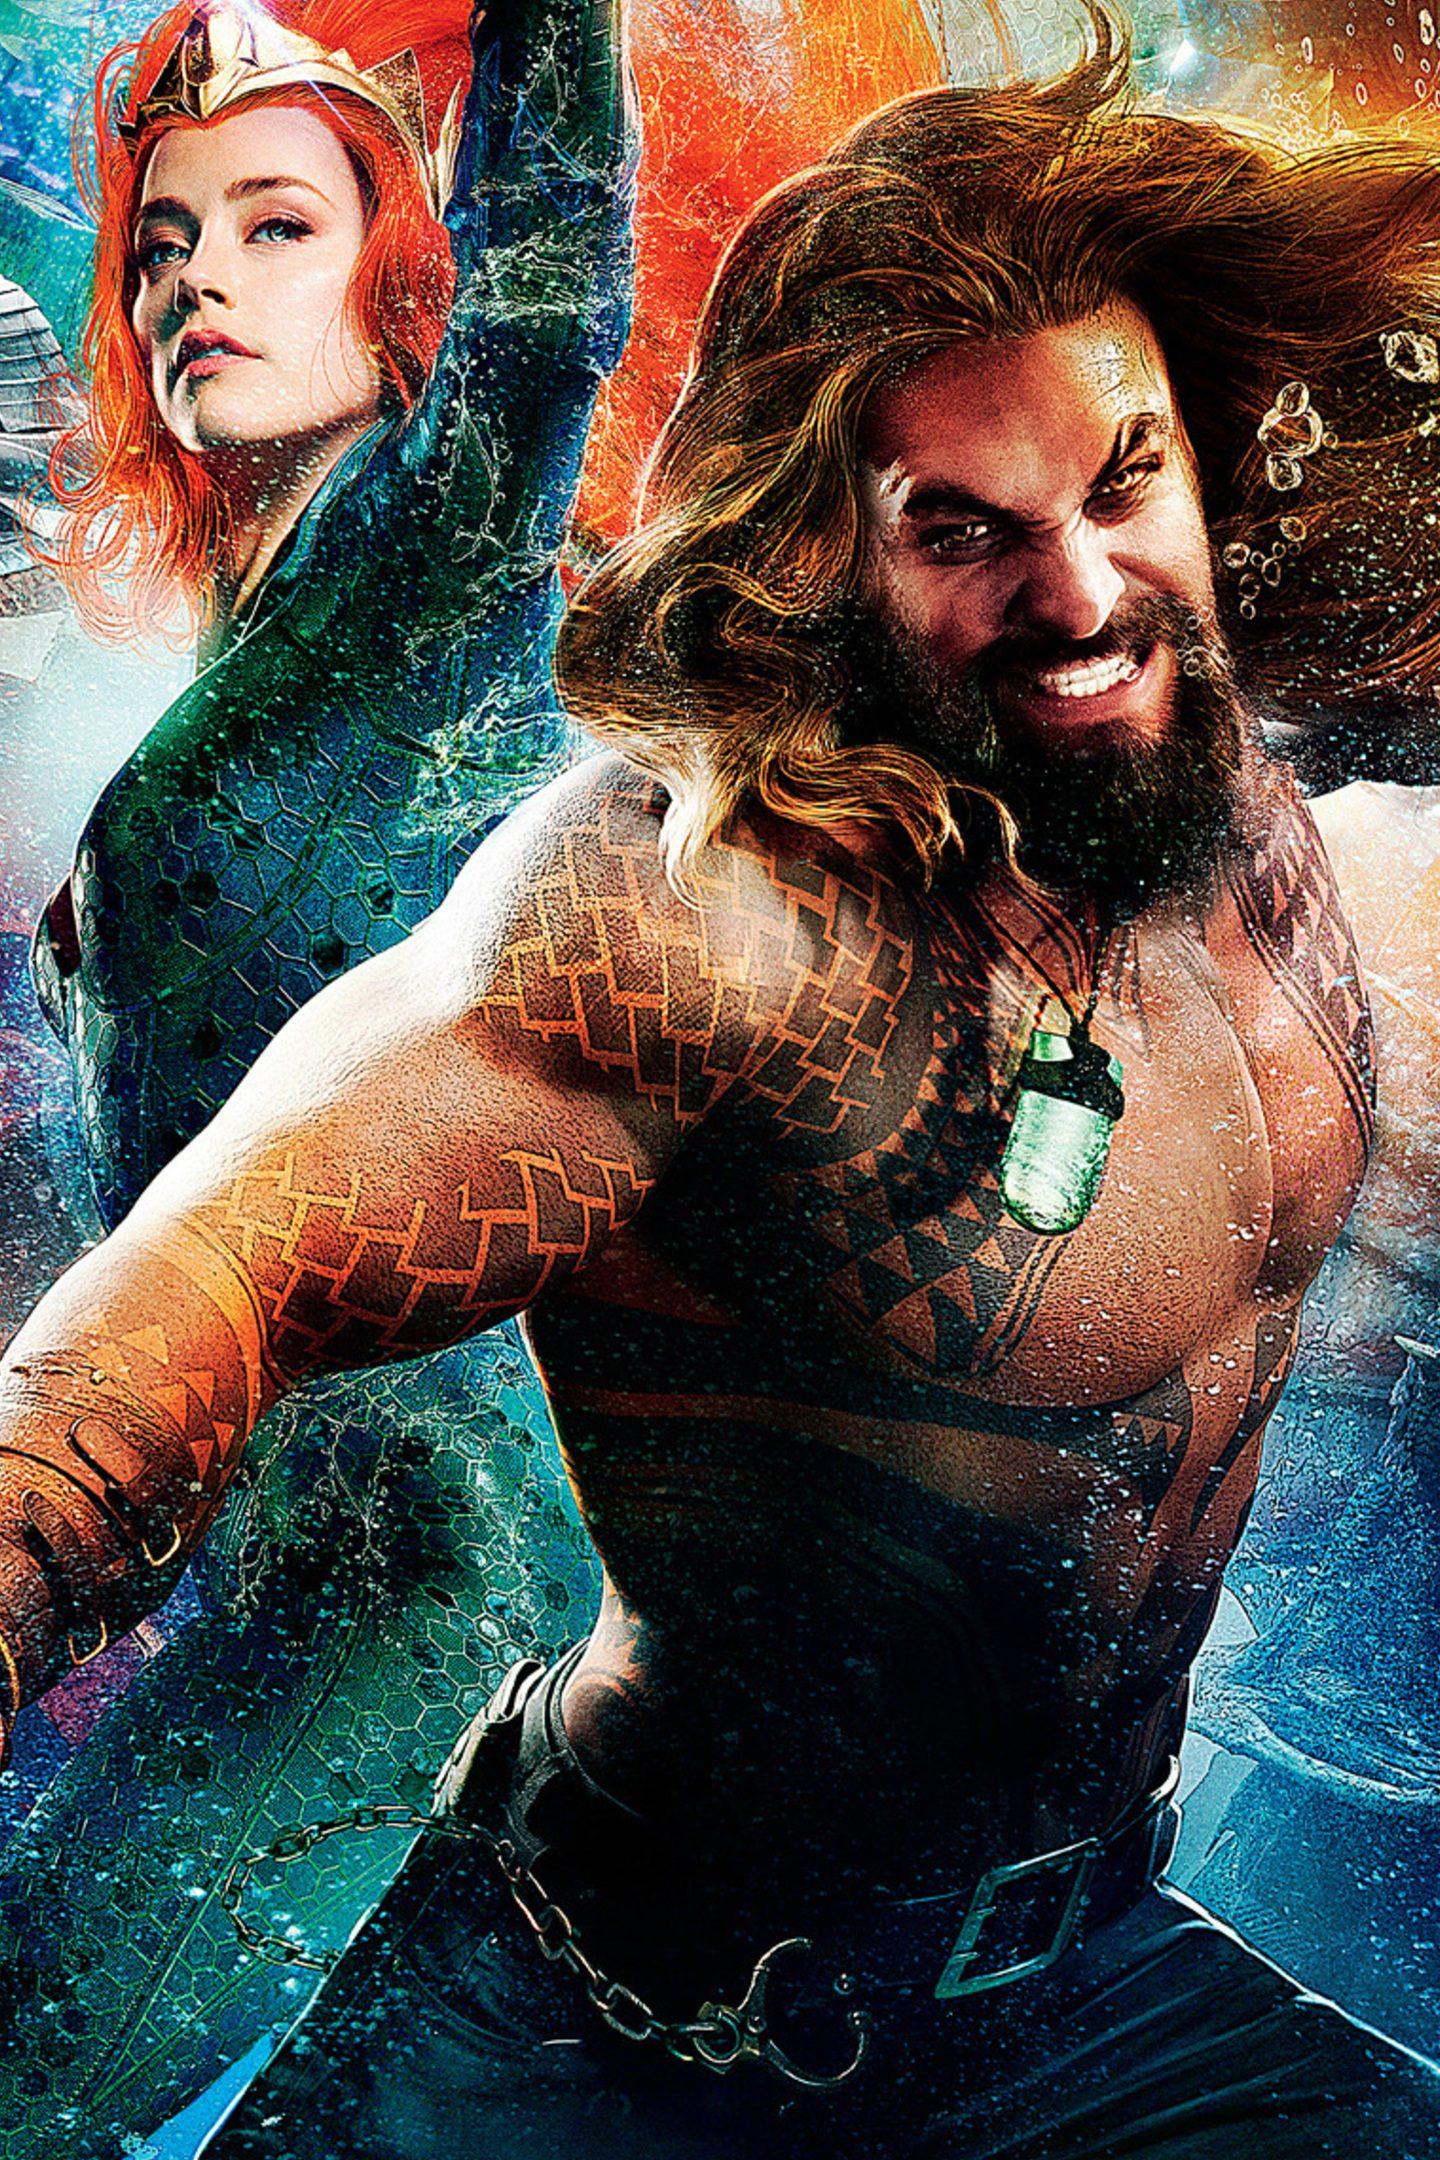 Aquaman 2018 Movie Poster 4K Wallpaper - Best Wallpapers